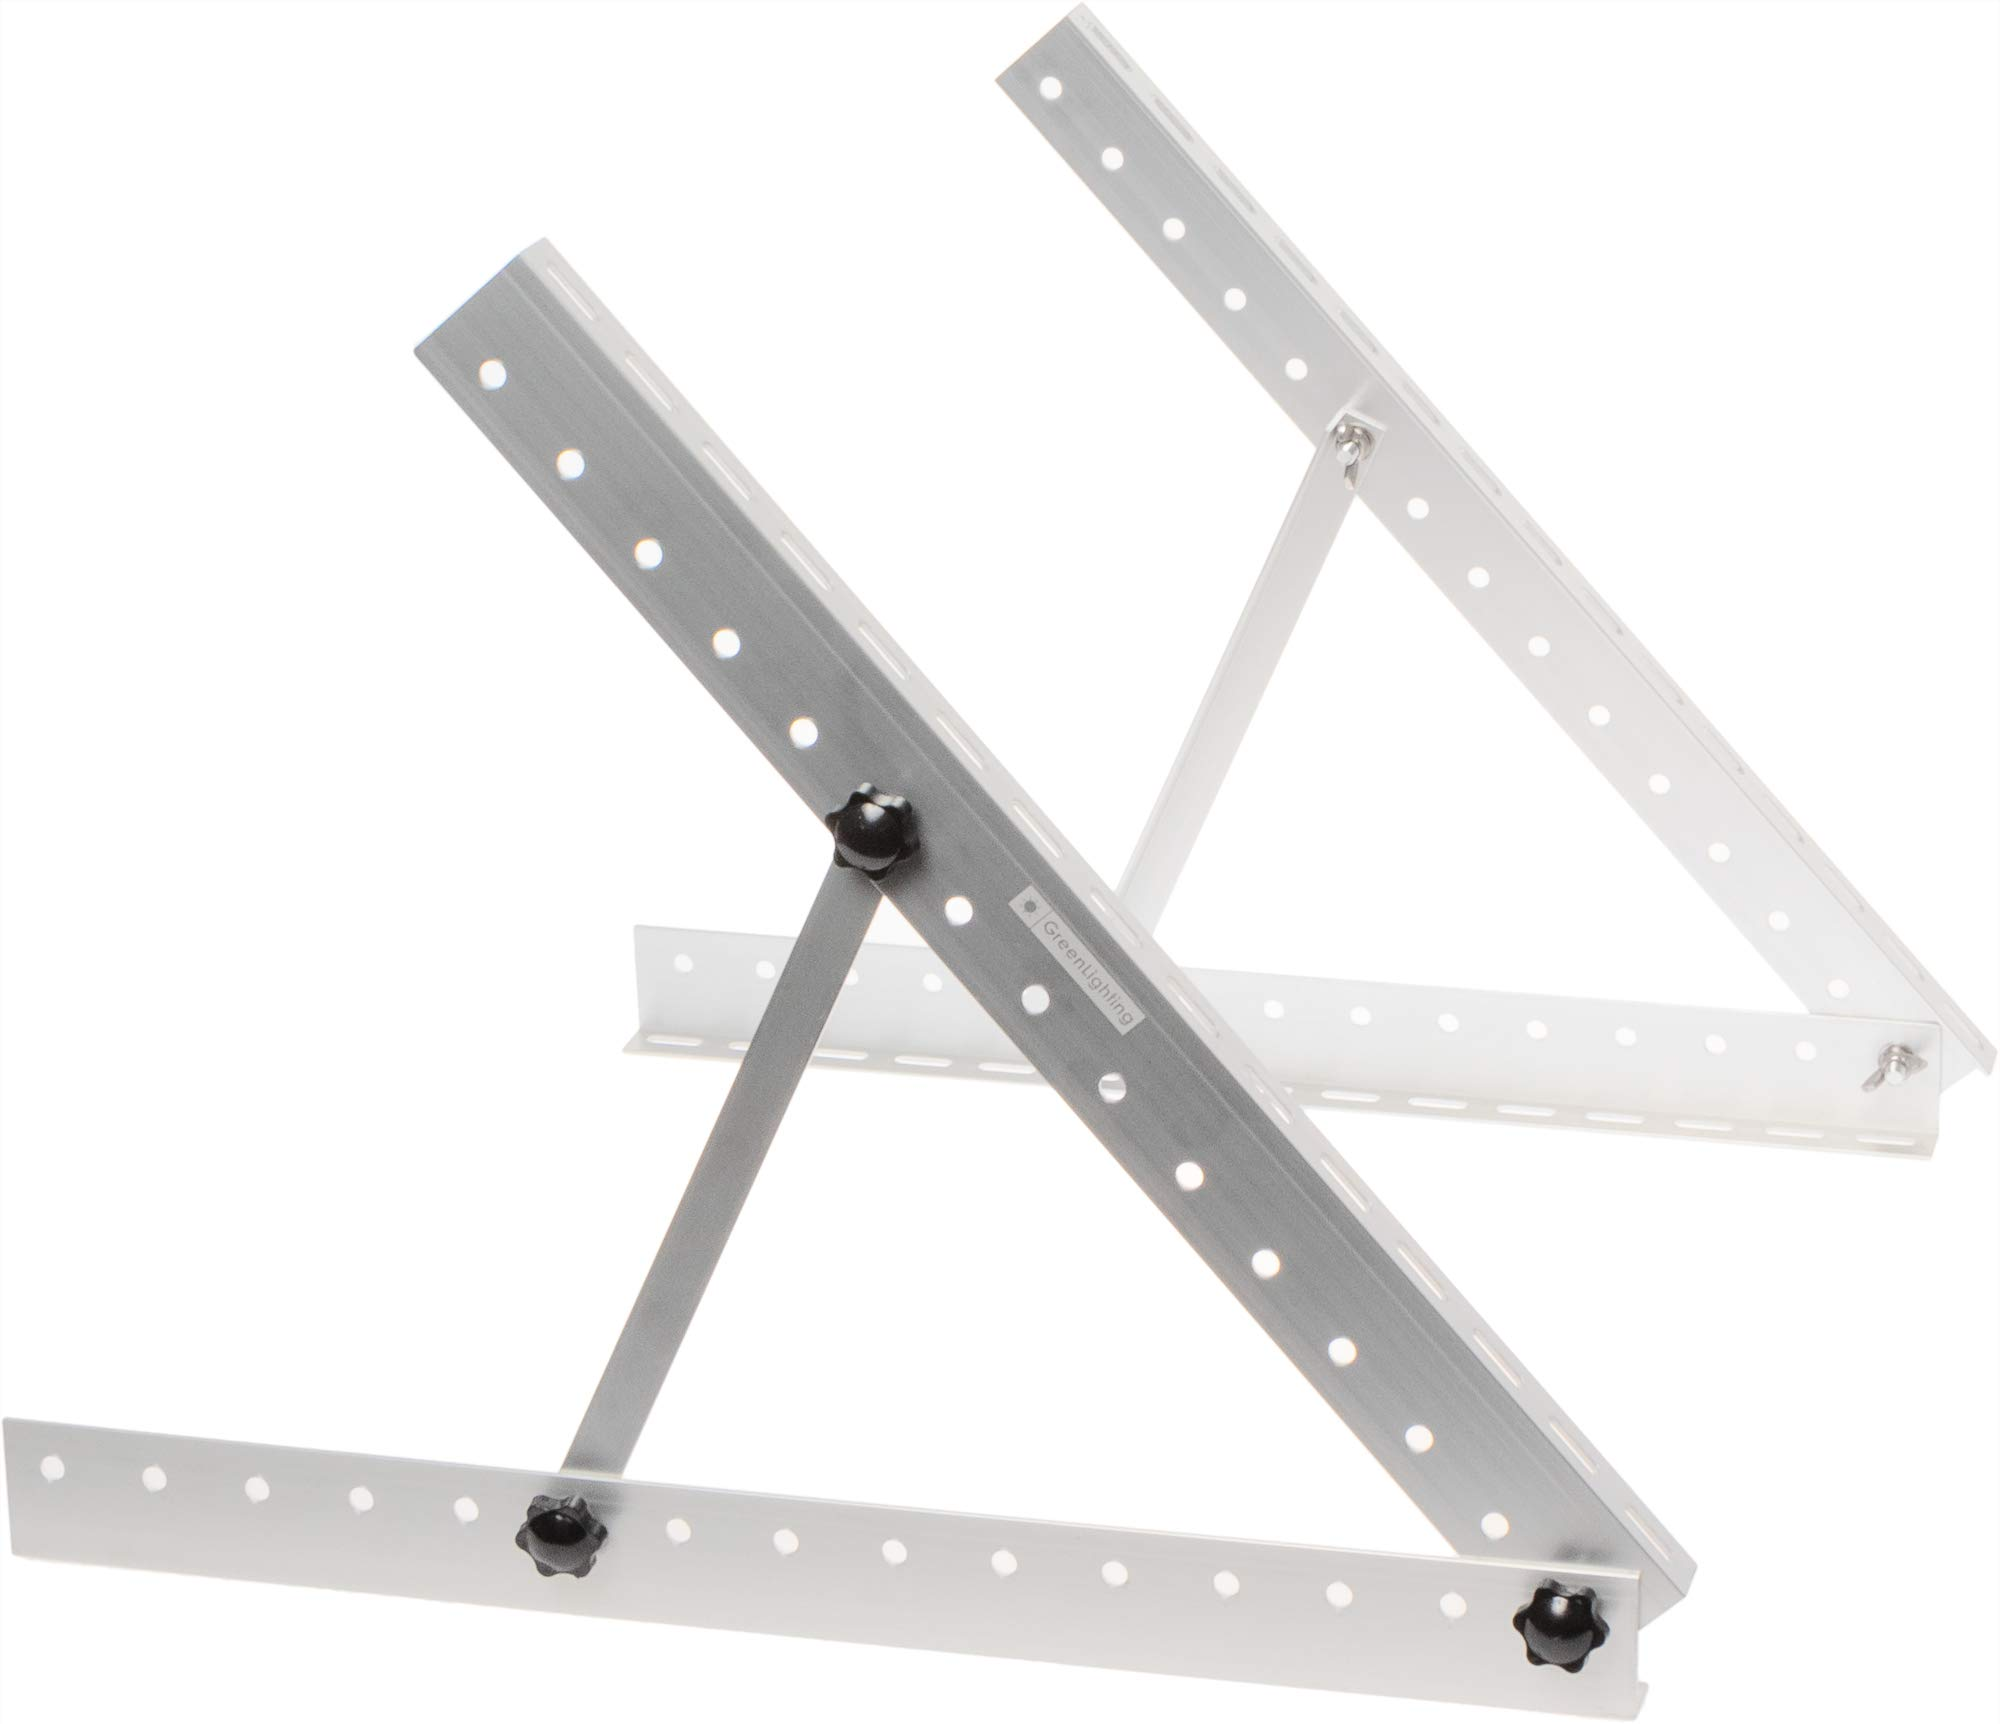 GreenLighting Aluminum Solar Panel Mounting Rack Bracket - 22 Inch Heavy Duty Adjustable Mount Kit for RV, Boat, Motorhome, Camping - 50lb Capacity by GreenLighting